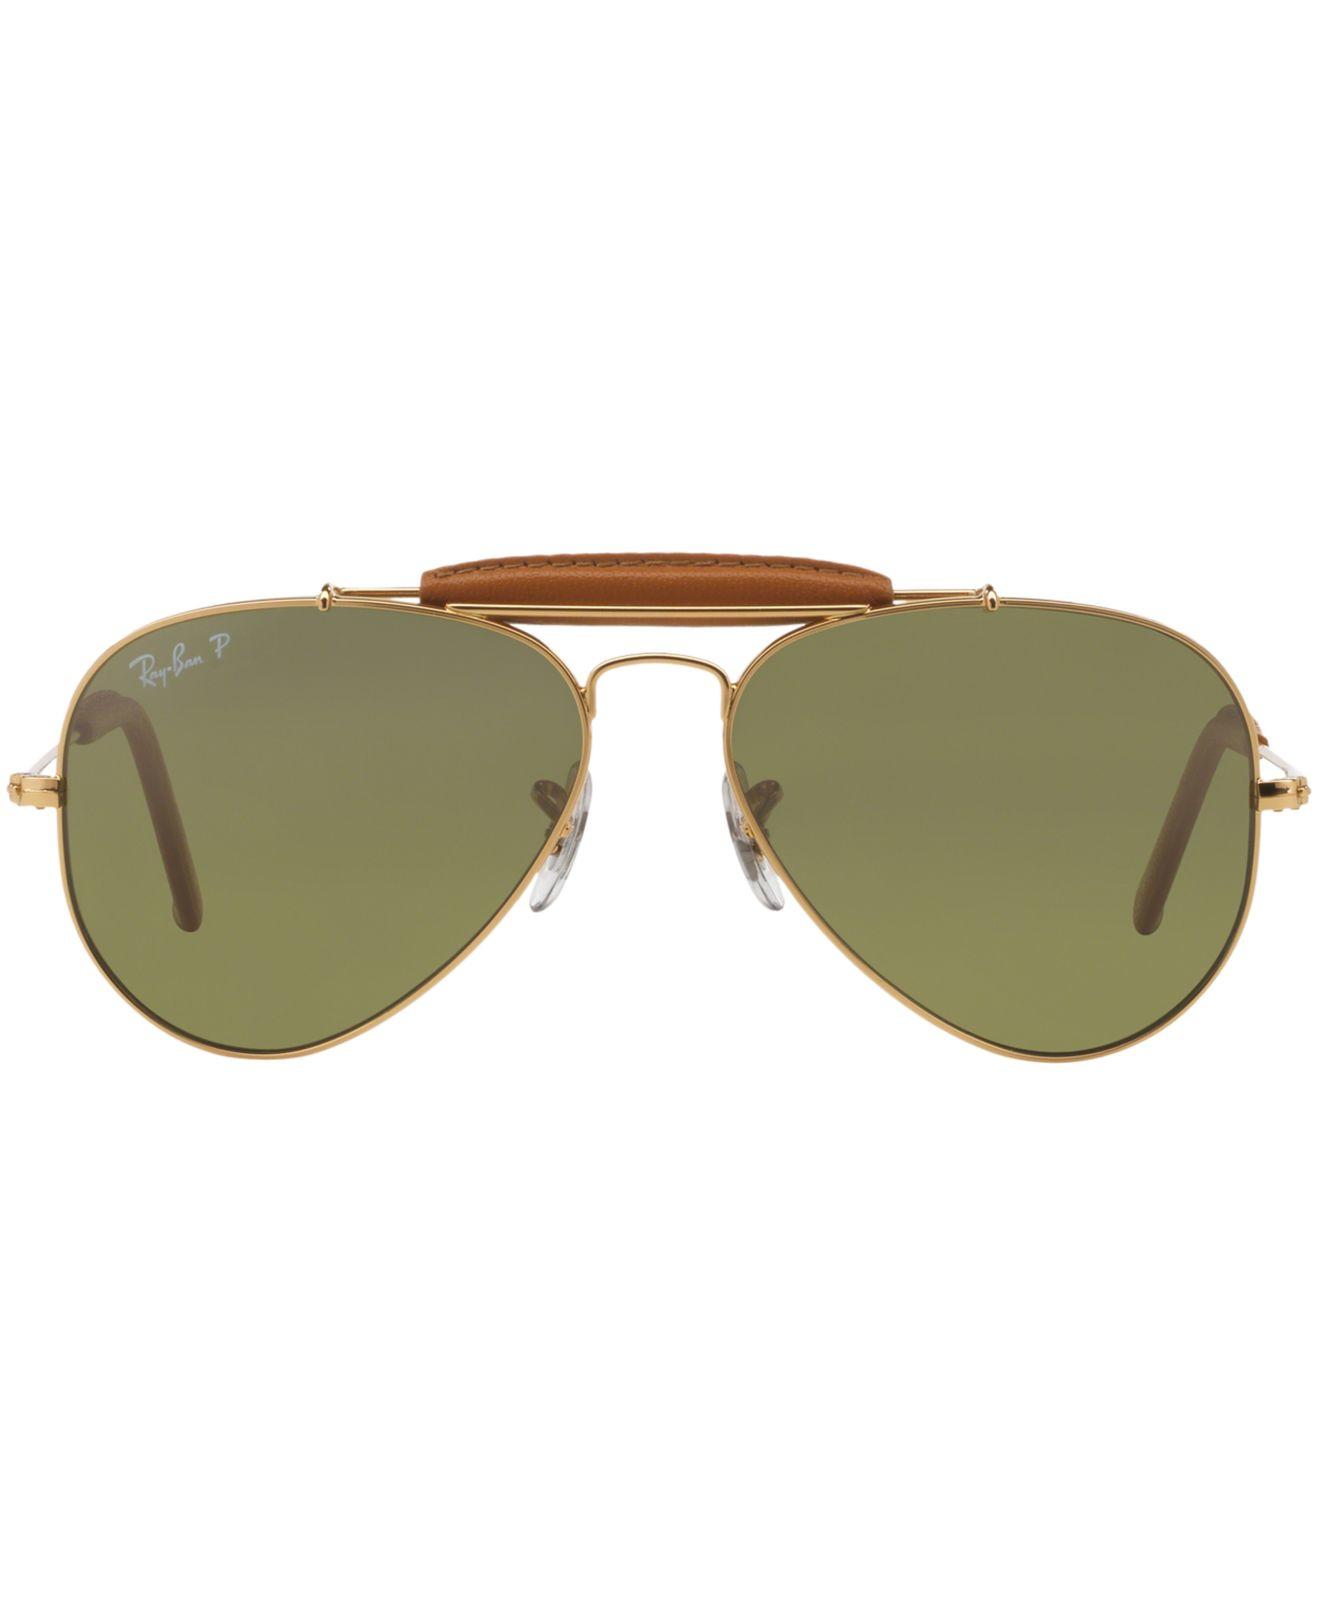 ray ban aviator sunglasses for men rb3422q